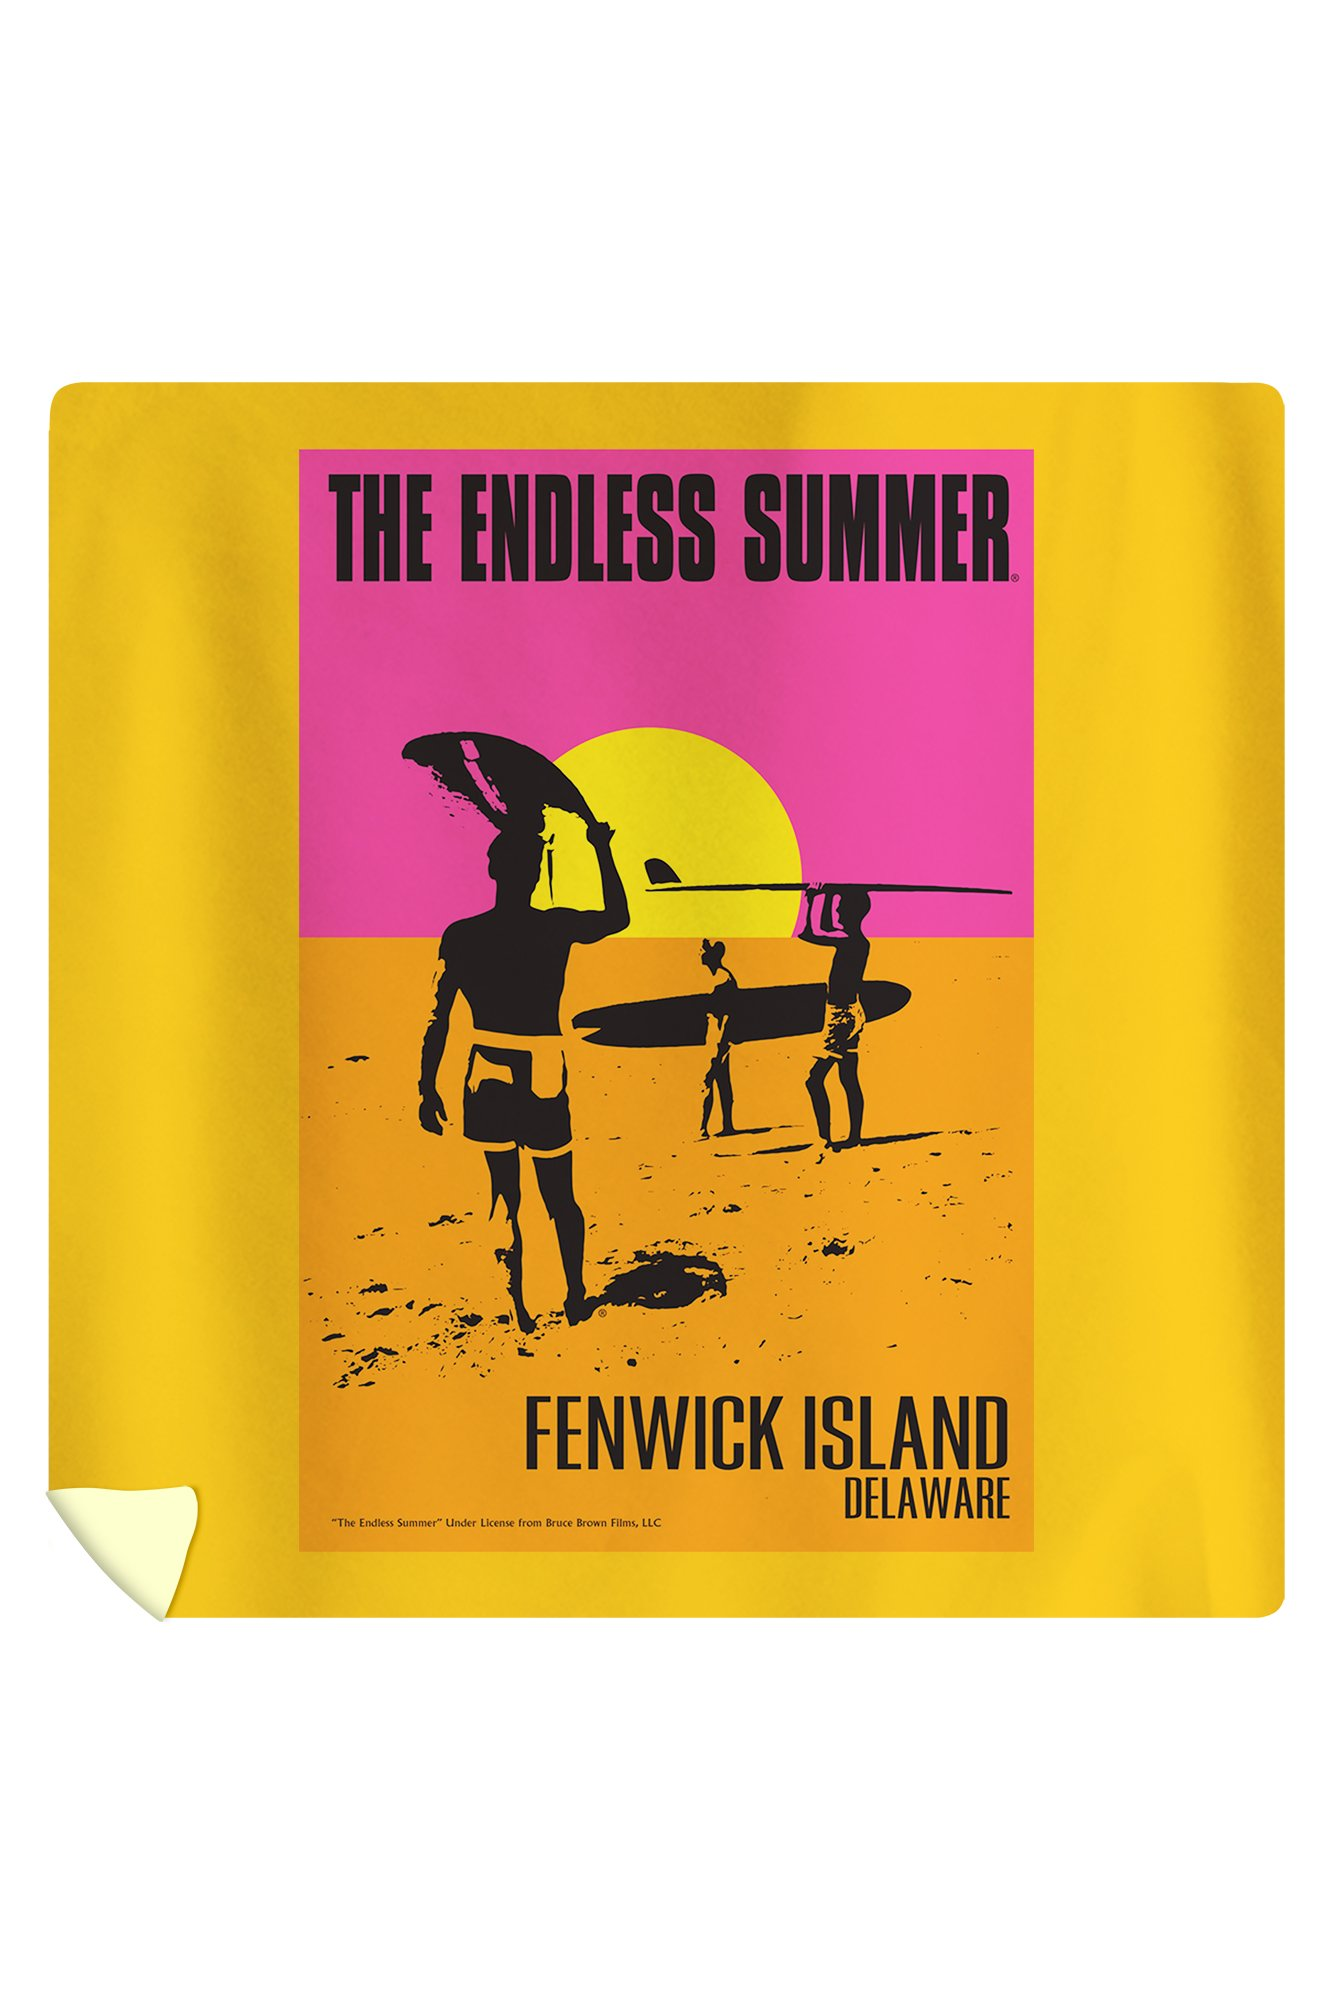 Fenwick Island, Delaware - The Endless Summer - Original Movie Poster (88x88 Queen Microfiber Duvet Cover)